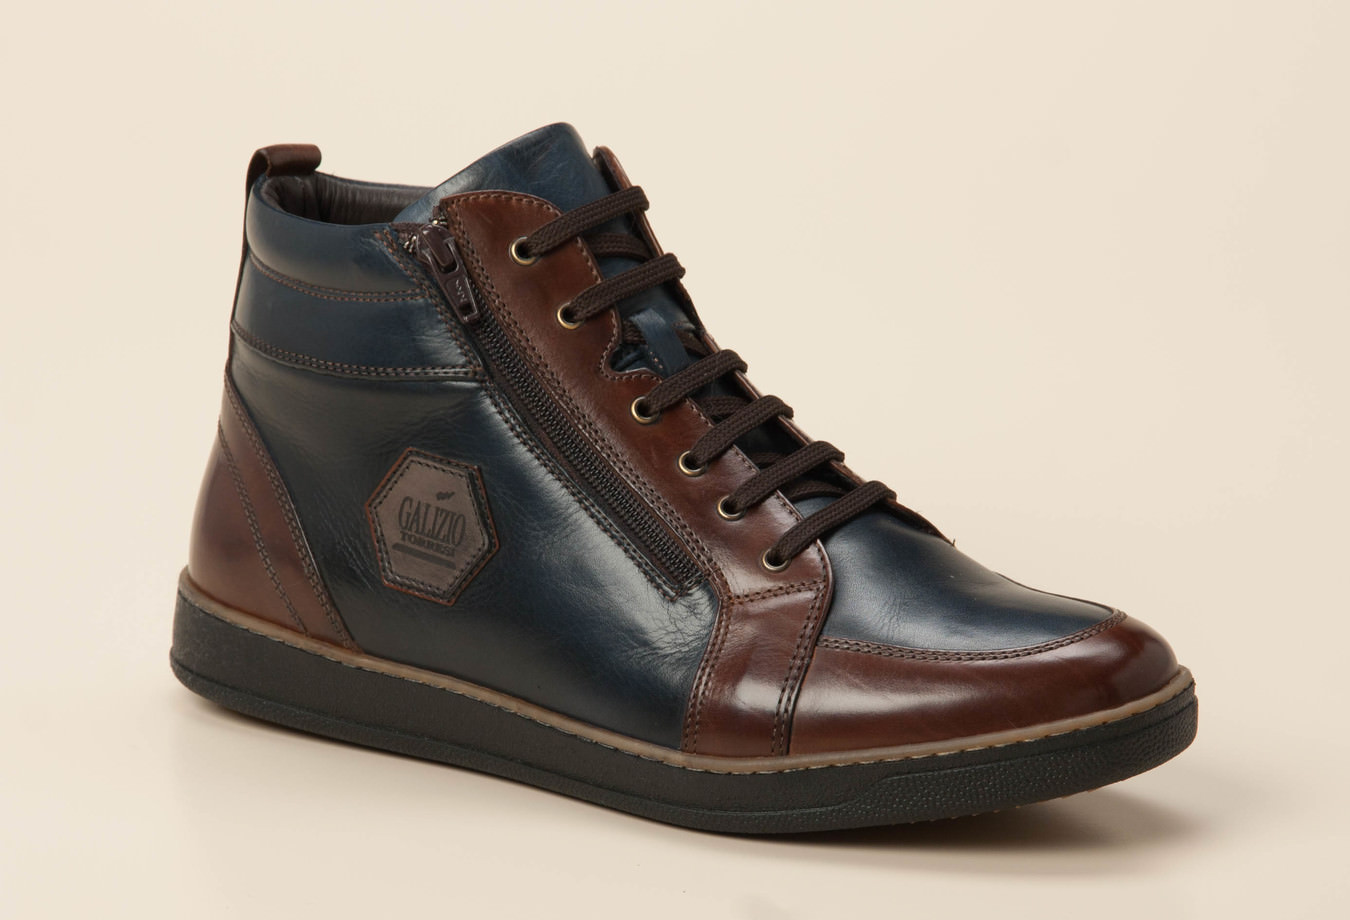 3faa7ac90af875 Galizio Torresi Herren Sneaker high in blau braun kaufen